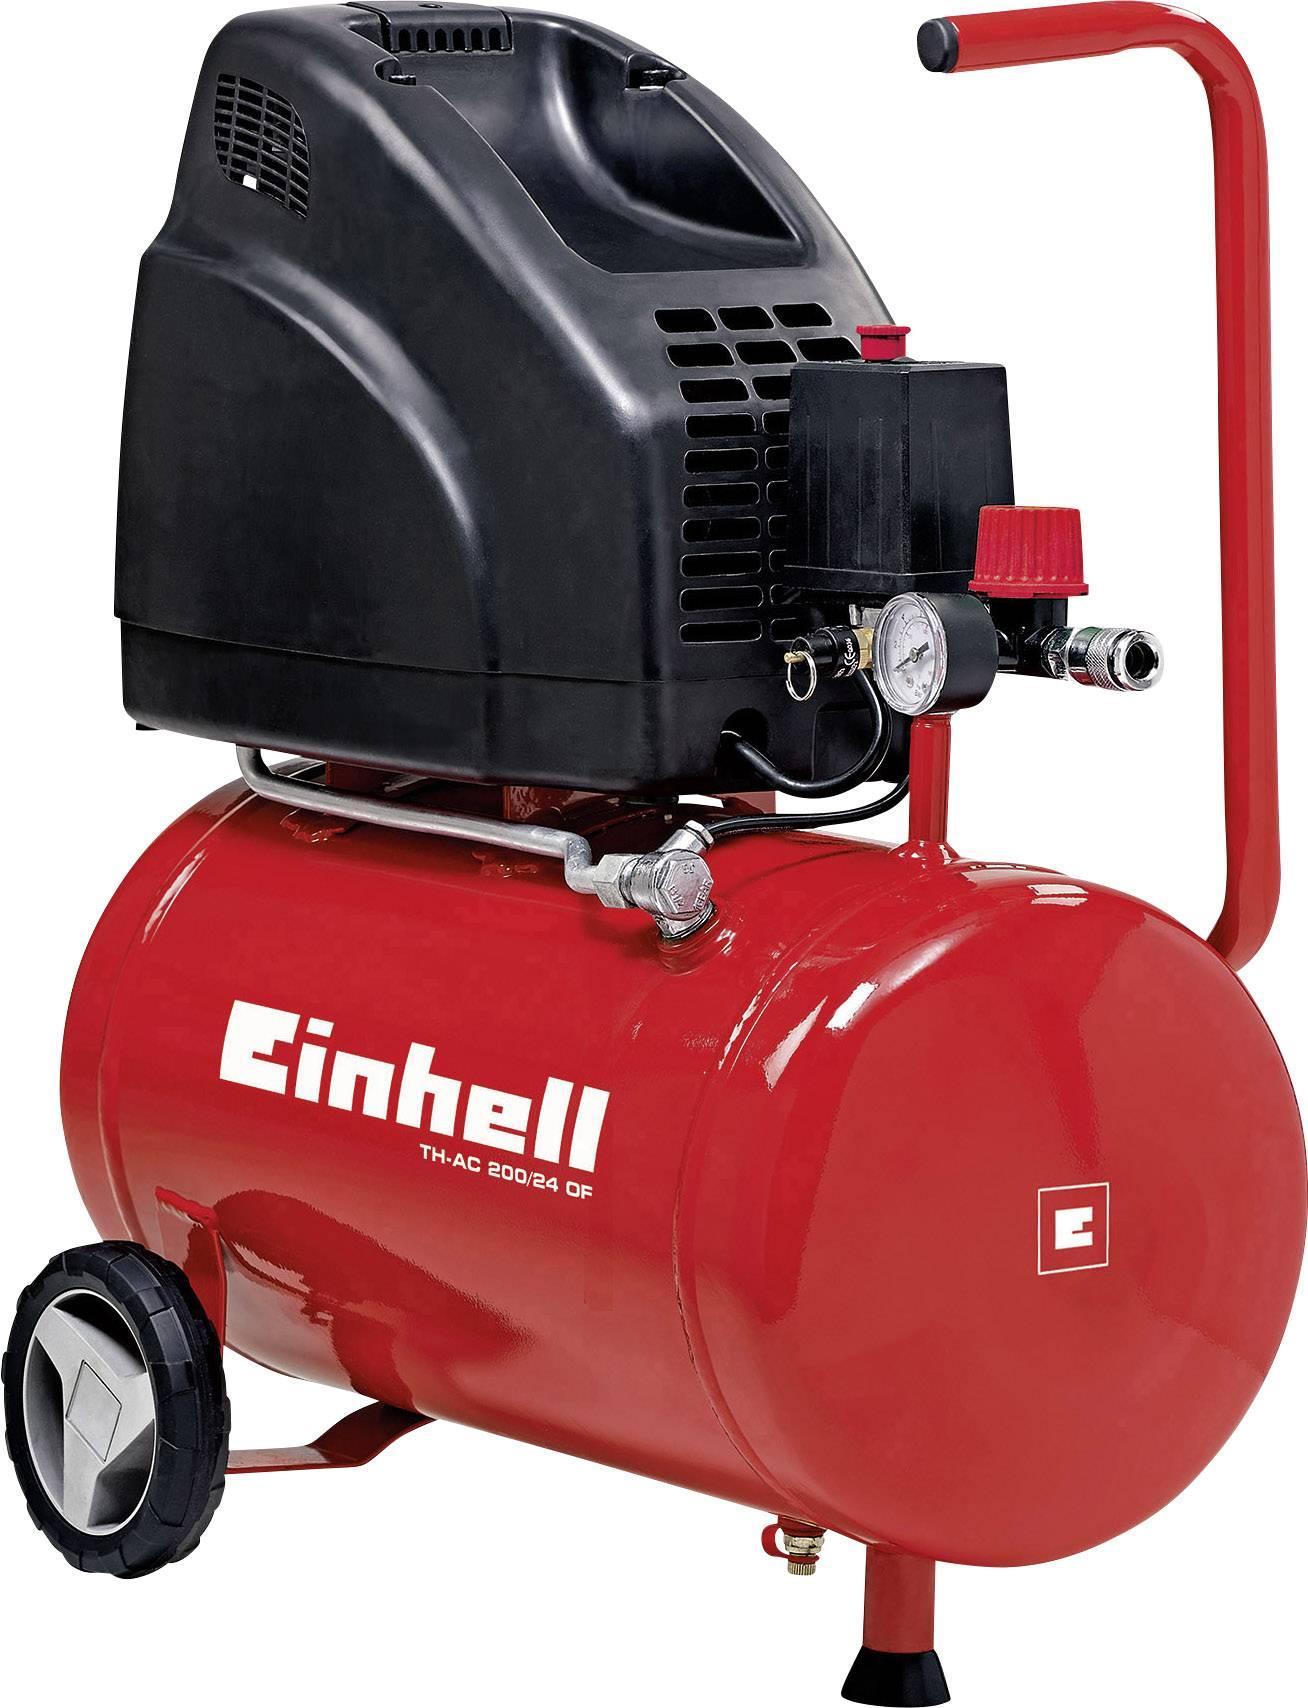 Einhell Compressore TH-AC 200/